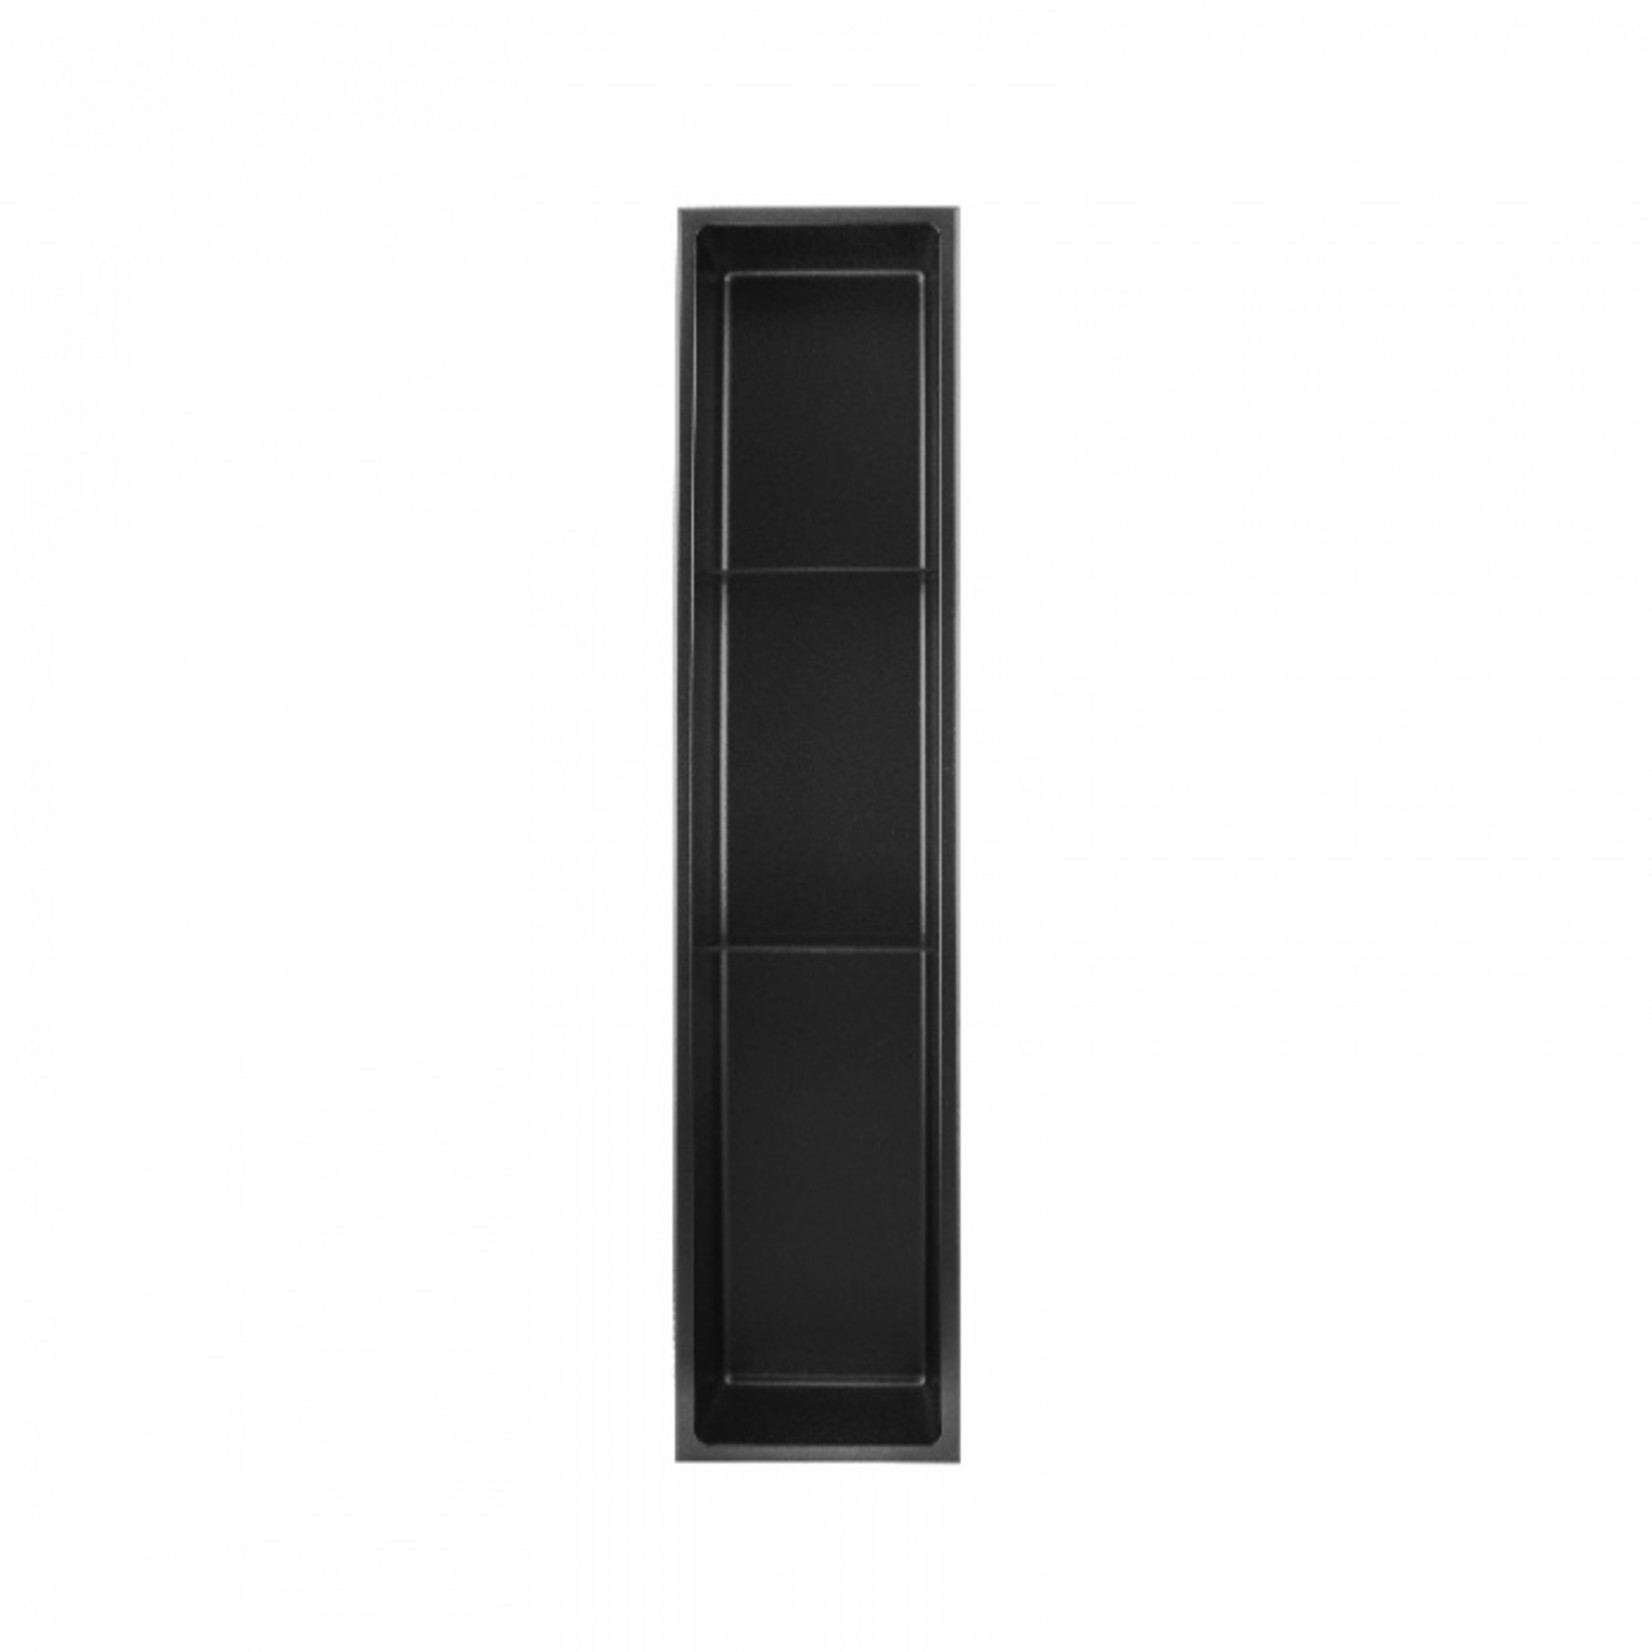 Wall niche with 2 shelves 36x8 Black Nautika NI368TB